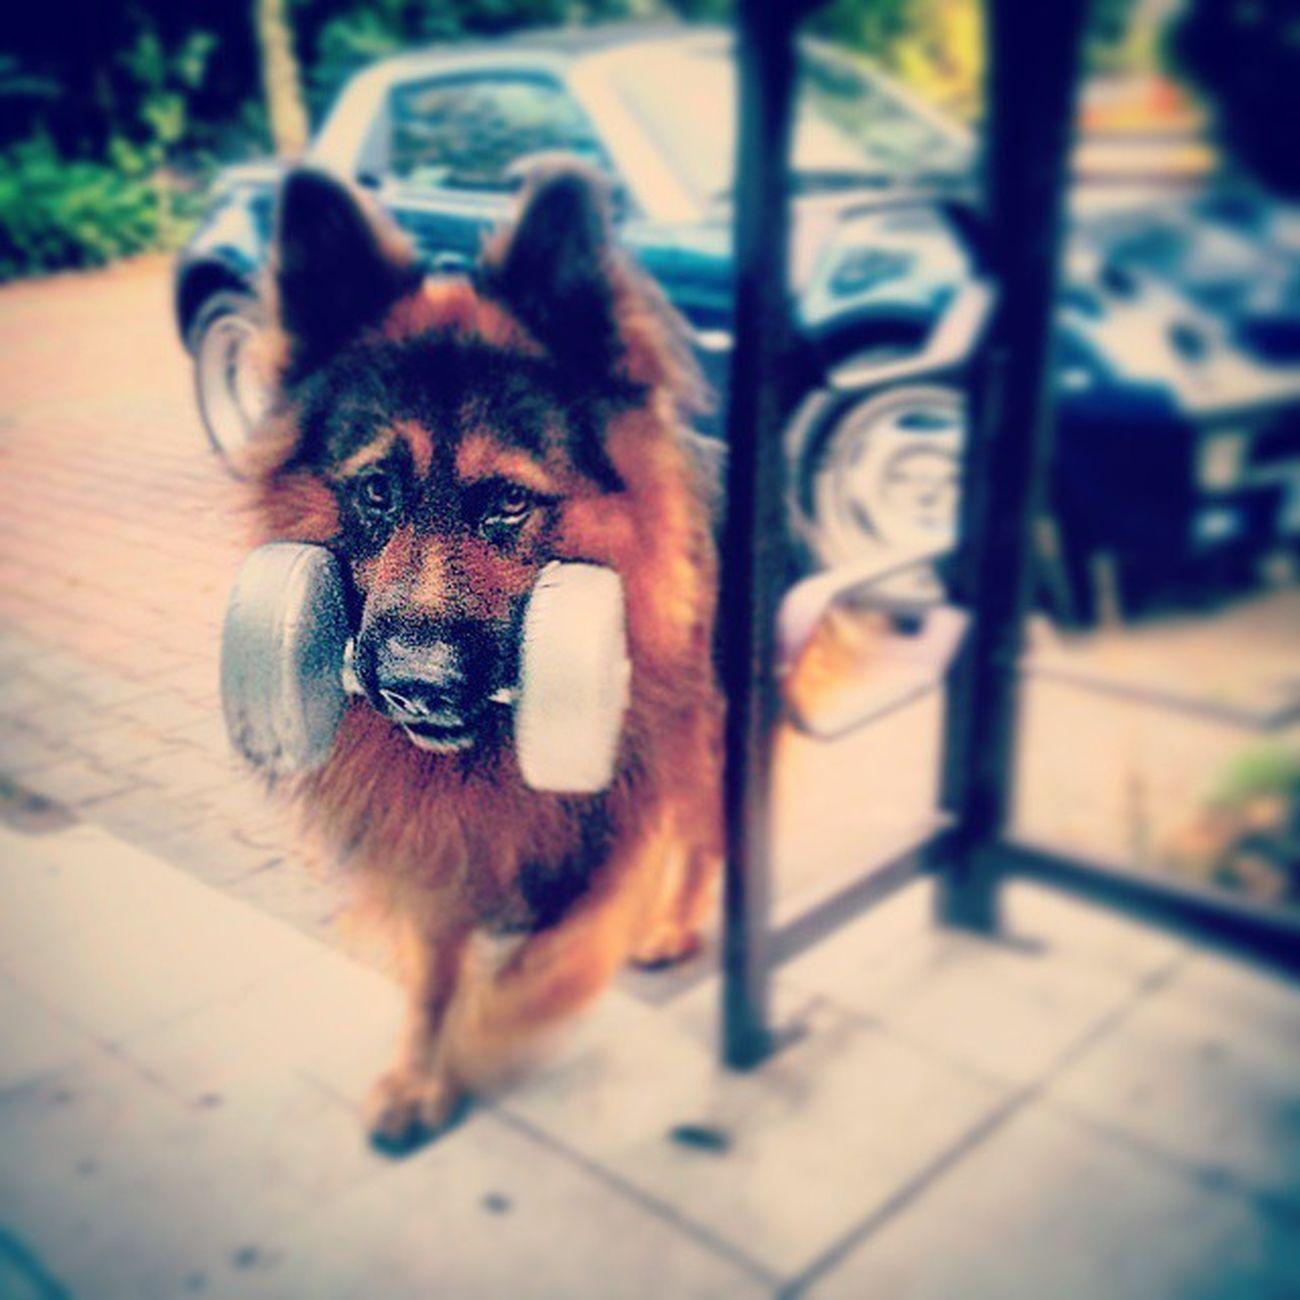 Ale Jestem Silny Hałhał Dog Weight Hantelek Strong Teeth Ouch Power